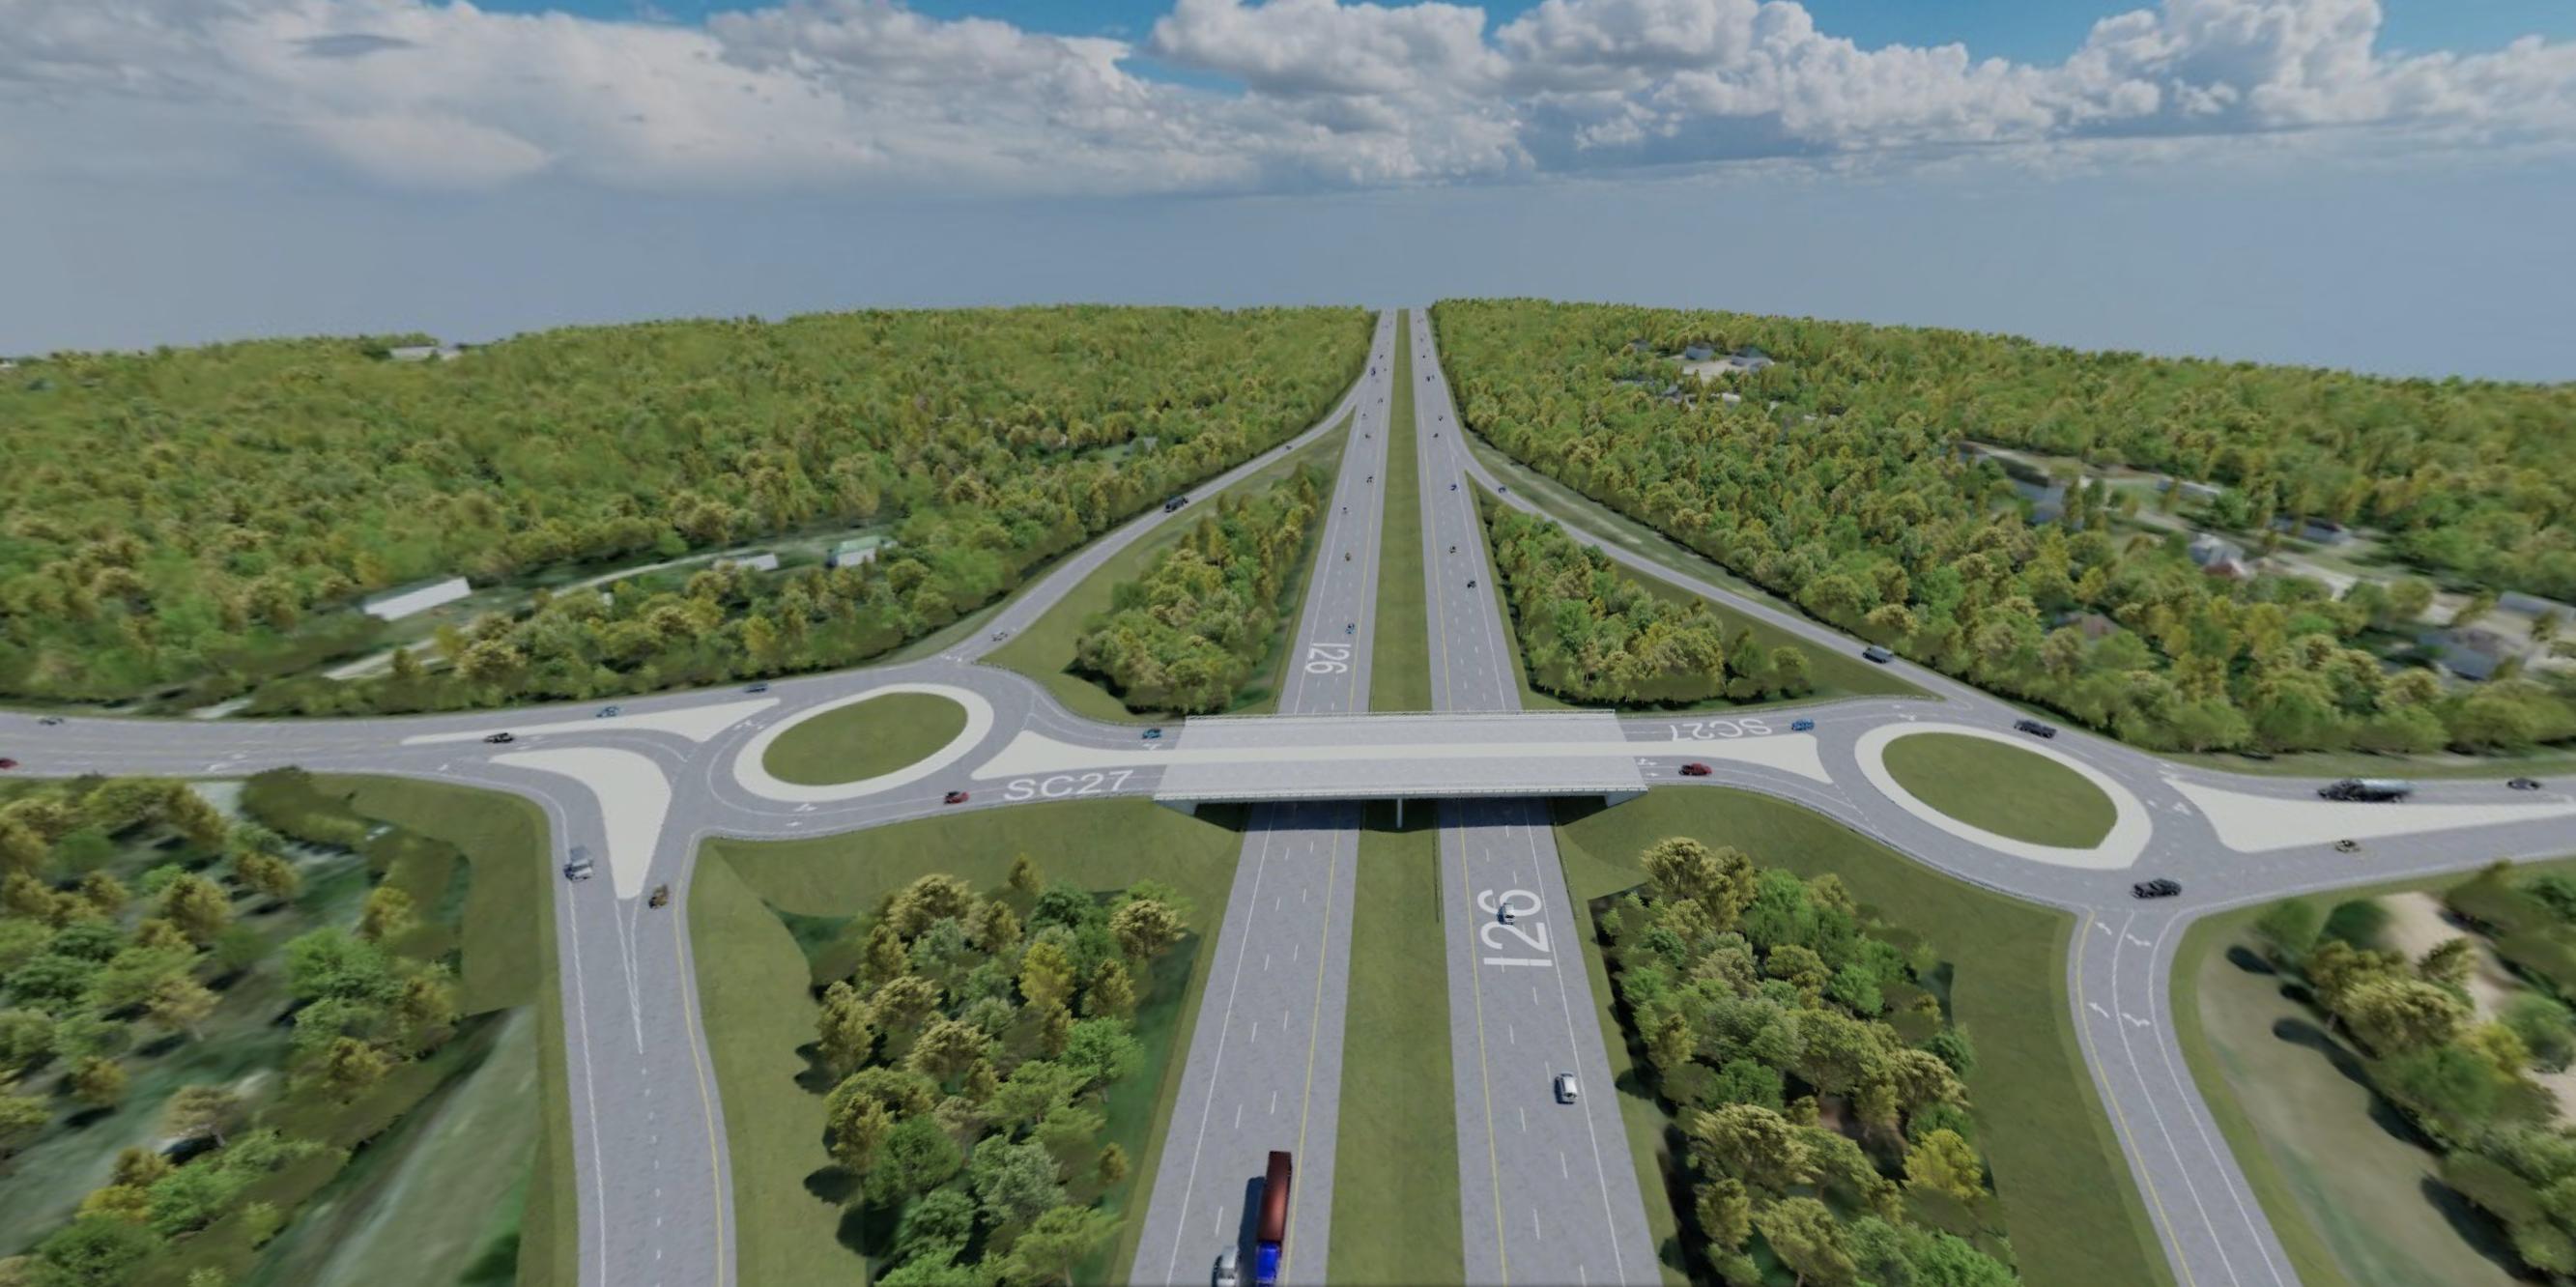 SCDOT I-26 Reconfiguration - Diamond Interchange with Roundabouts | RDV Systems